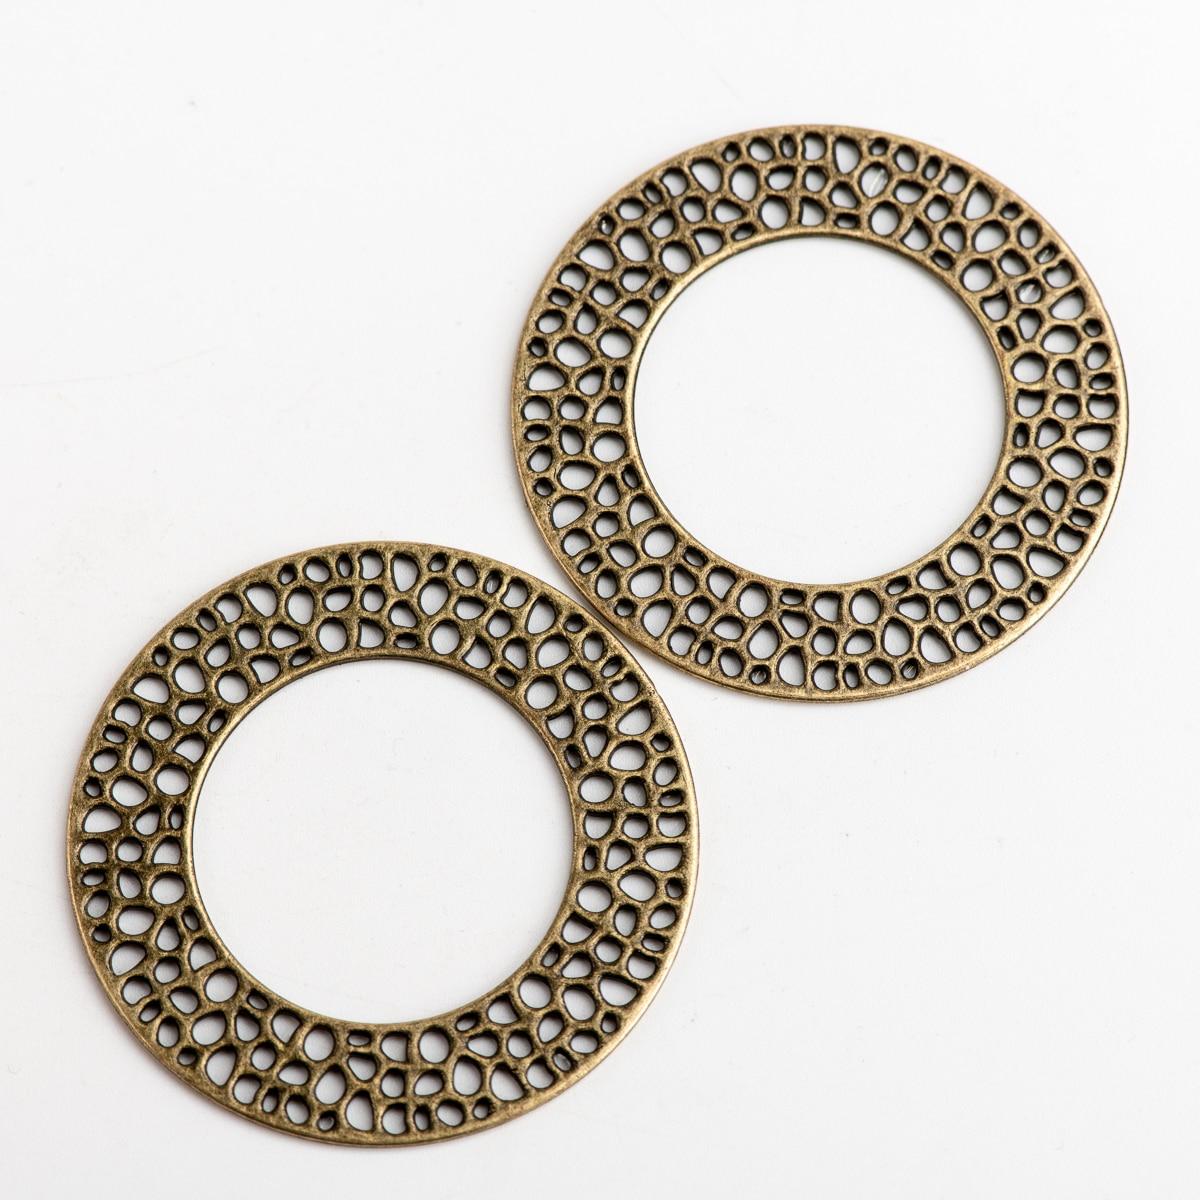 High Quality DIY Alloy Pendant Jewelry Findings Charms Jewelry Findings & Components For Jewelry Making #JY224